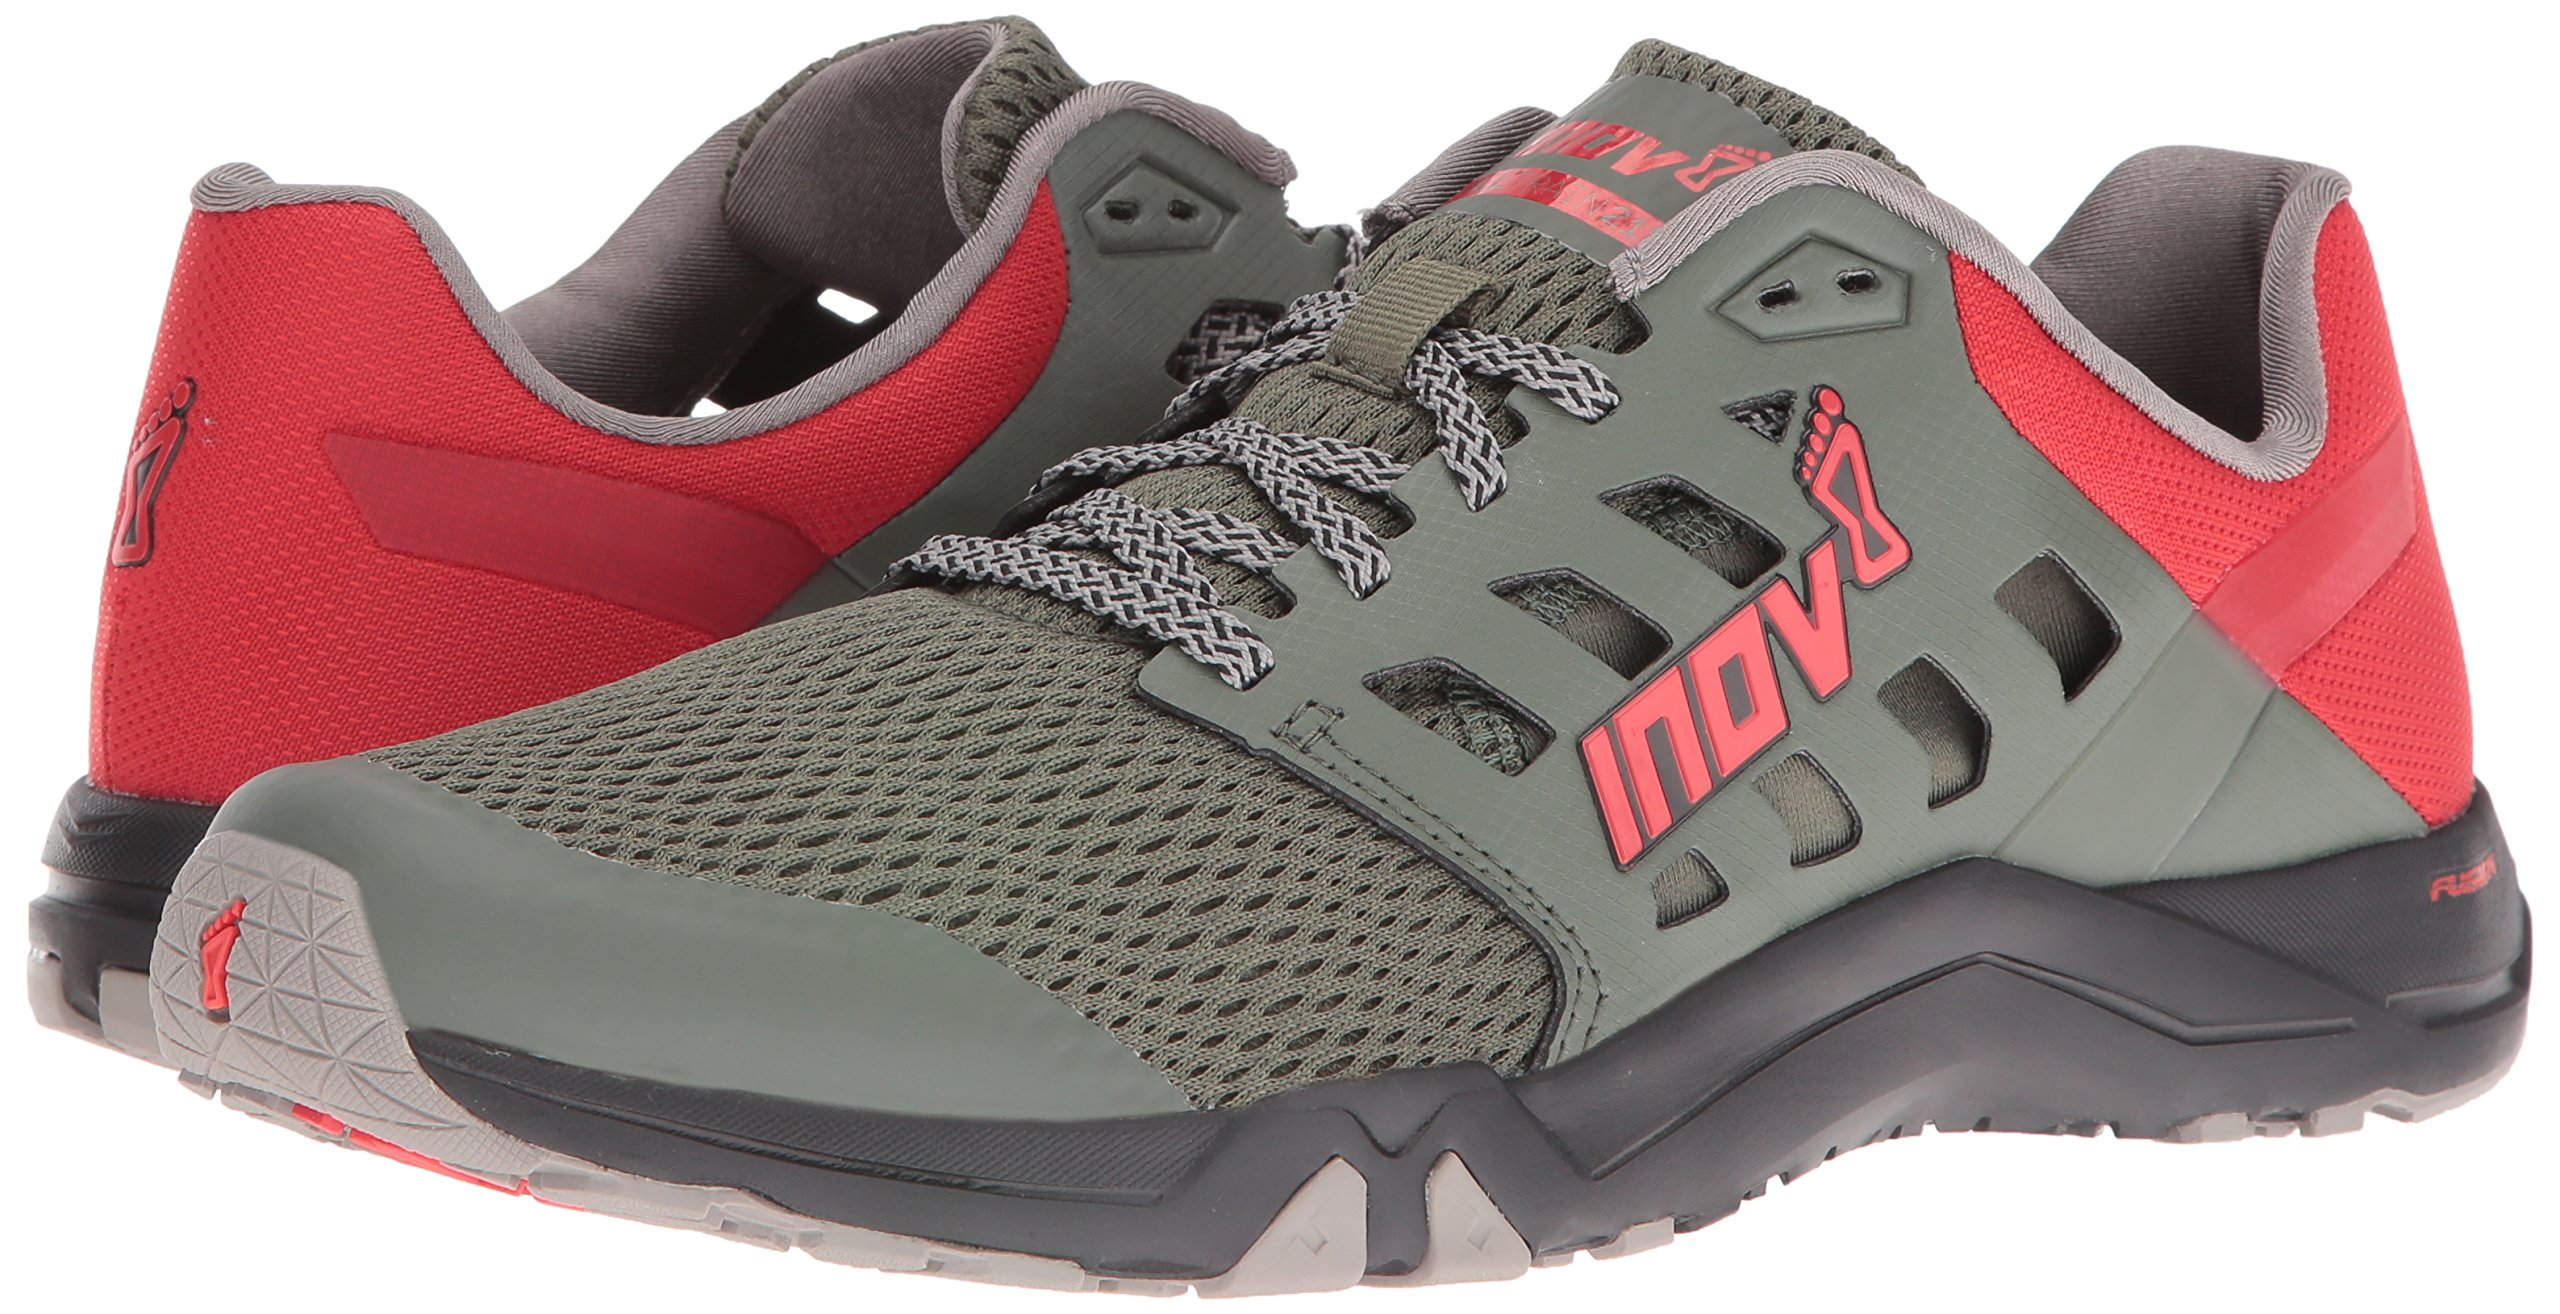 Inov-8 Men's All Train 215 Cross-Trainer Shoe, Dark Green/Red/Black, 12 D US by Inov-8 (Image #6)